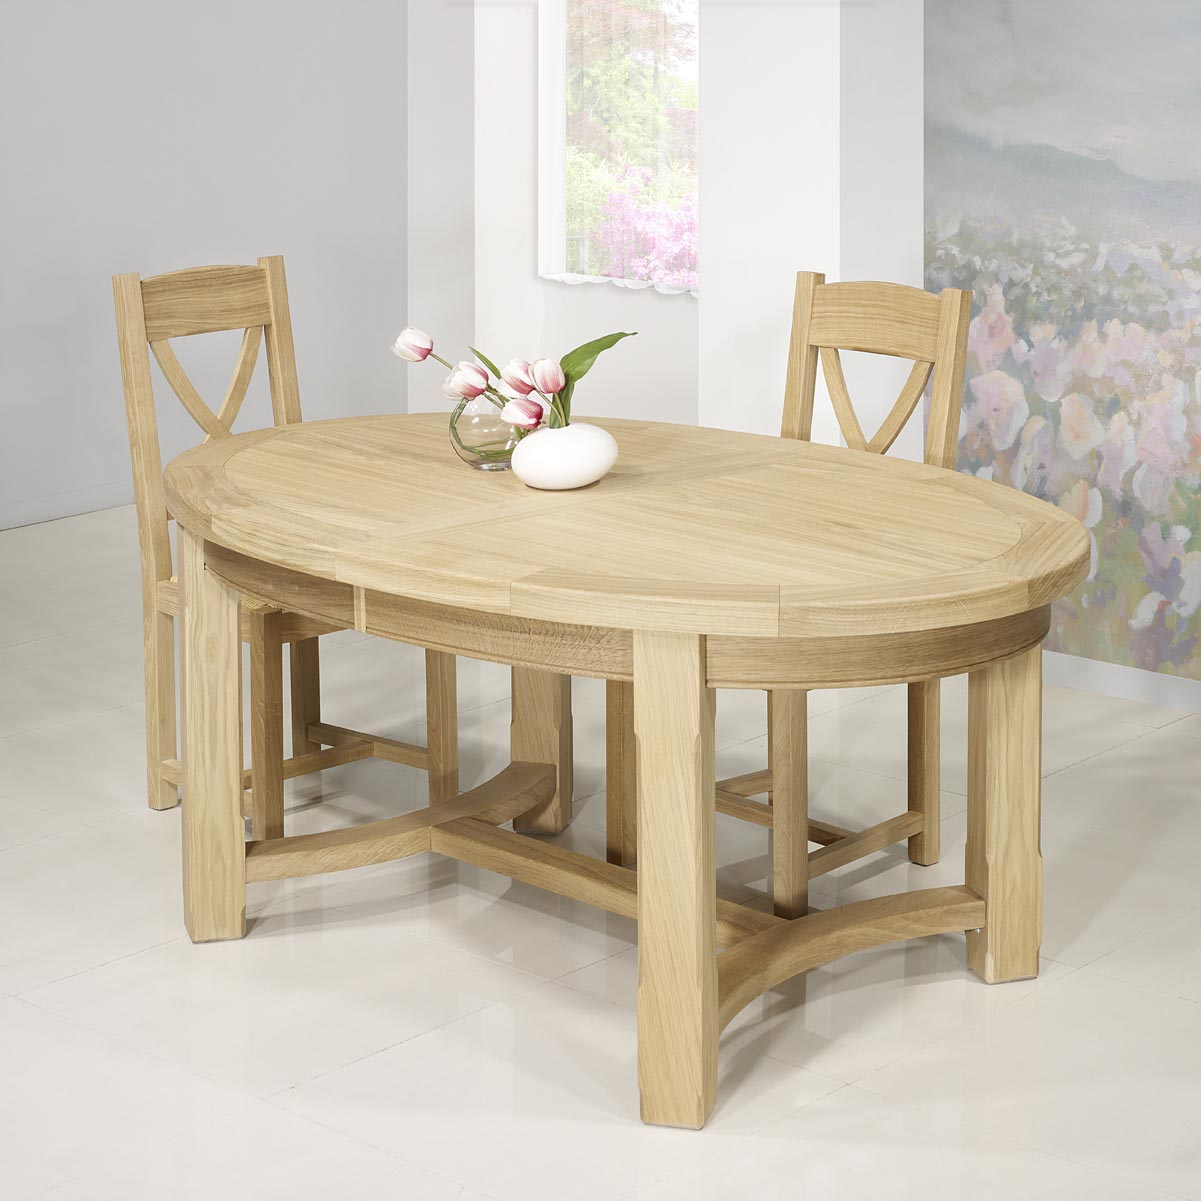 table de ferme ovale tom en ch ne massif de style campagnard 170 110 meuble en ch ne massif. Black Bedroom Furniture Sets. Home Design Ideas